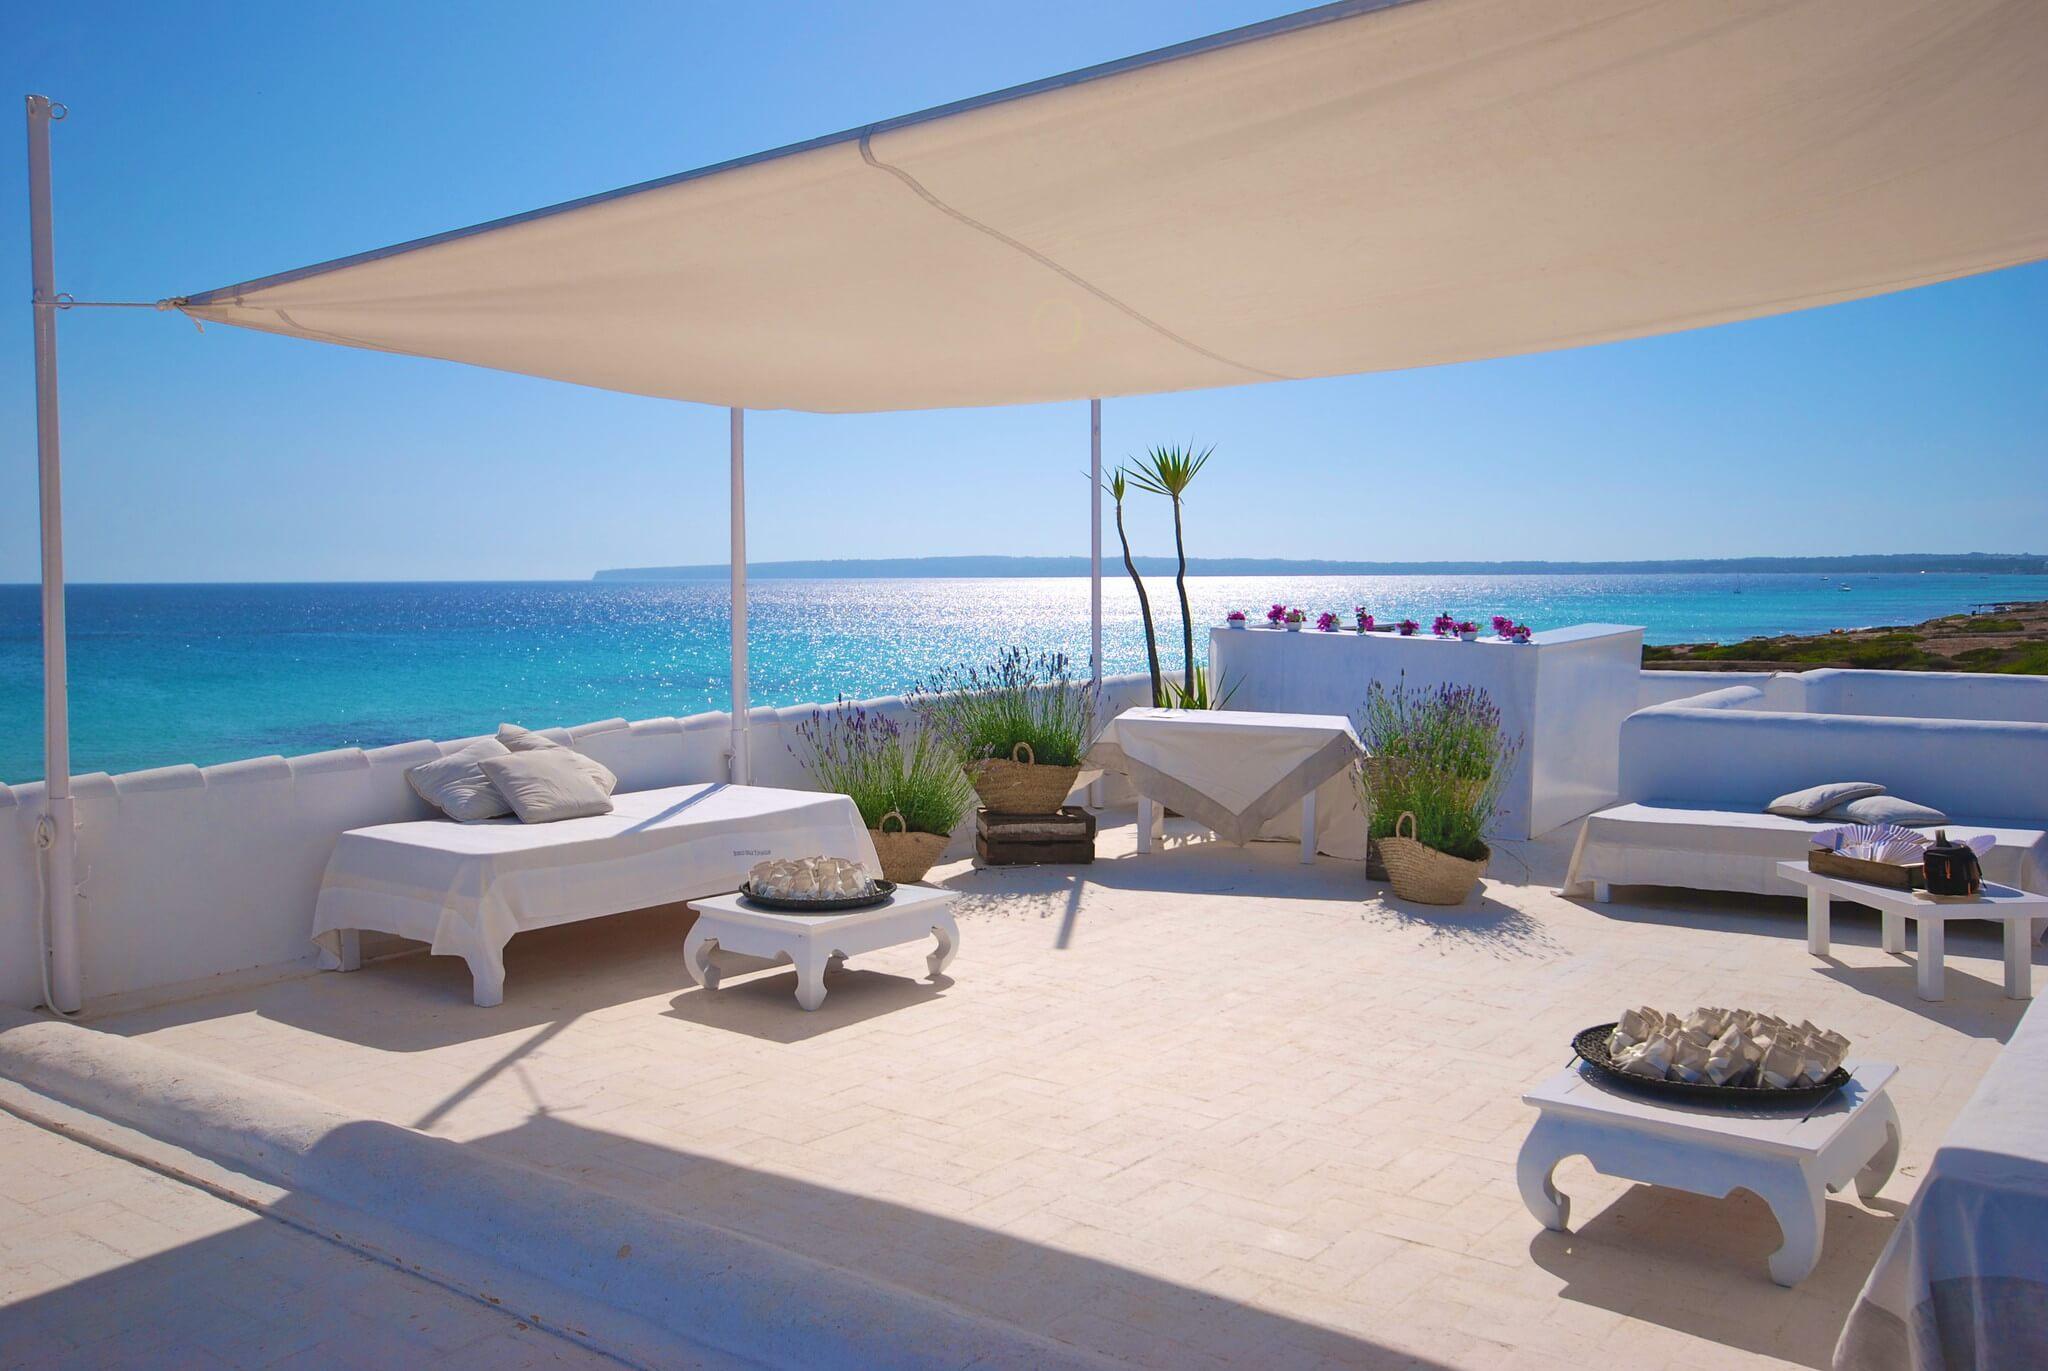 https://www.white-ibiza.com/wp-content/uploads/2020/03/formentera-beach-restaurants-10-punto7-2020-07.jpg